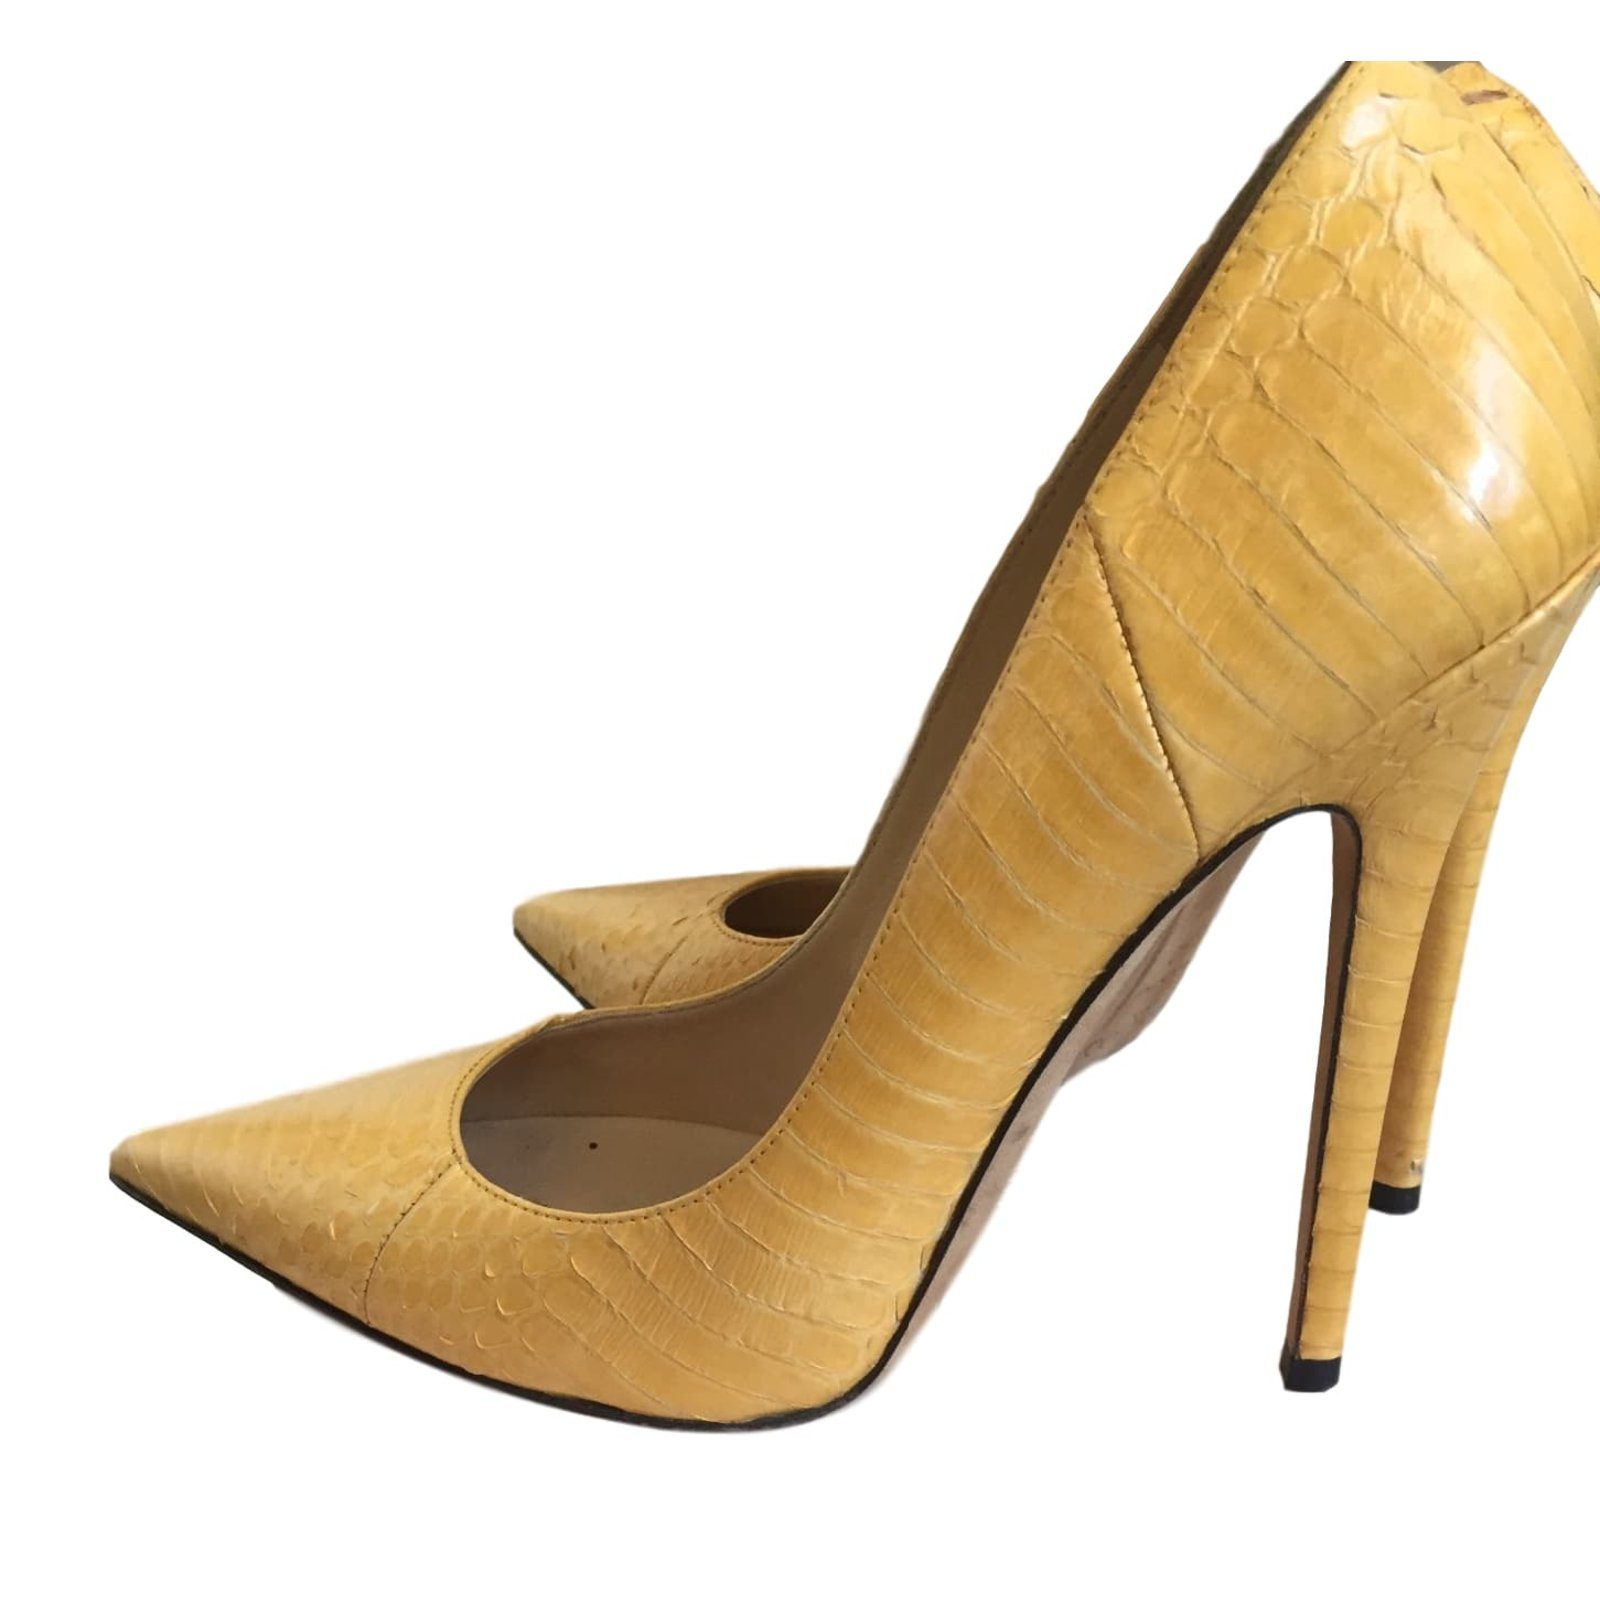 Jimmy Choo Pumps Heels Python Yellow